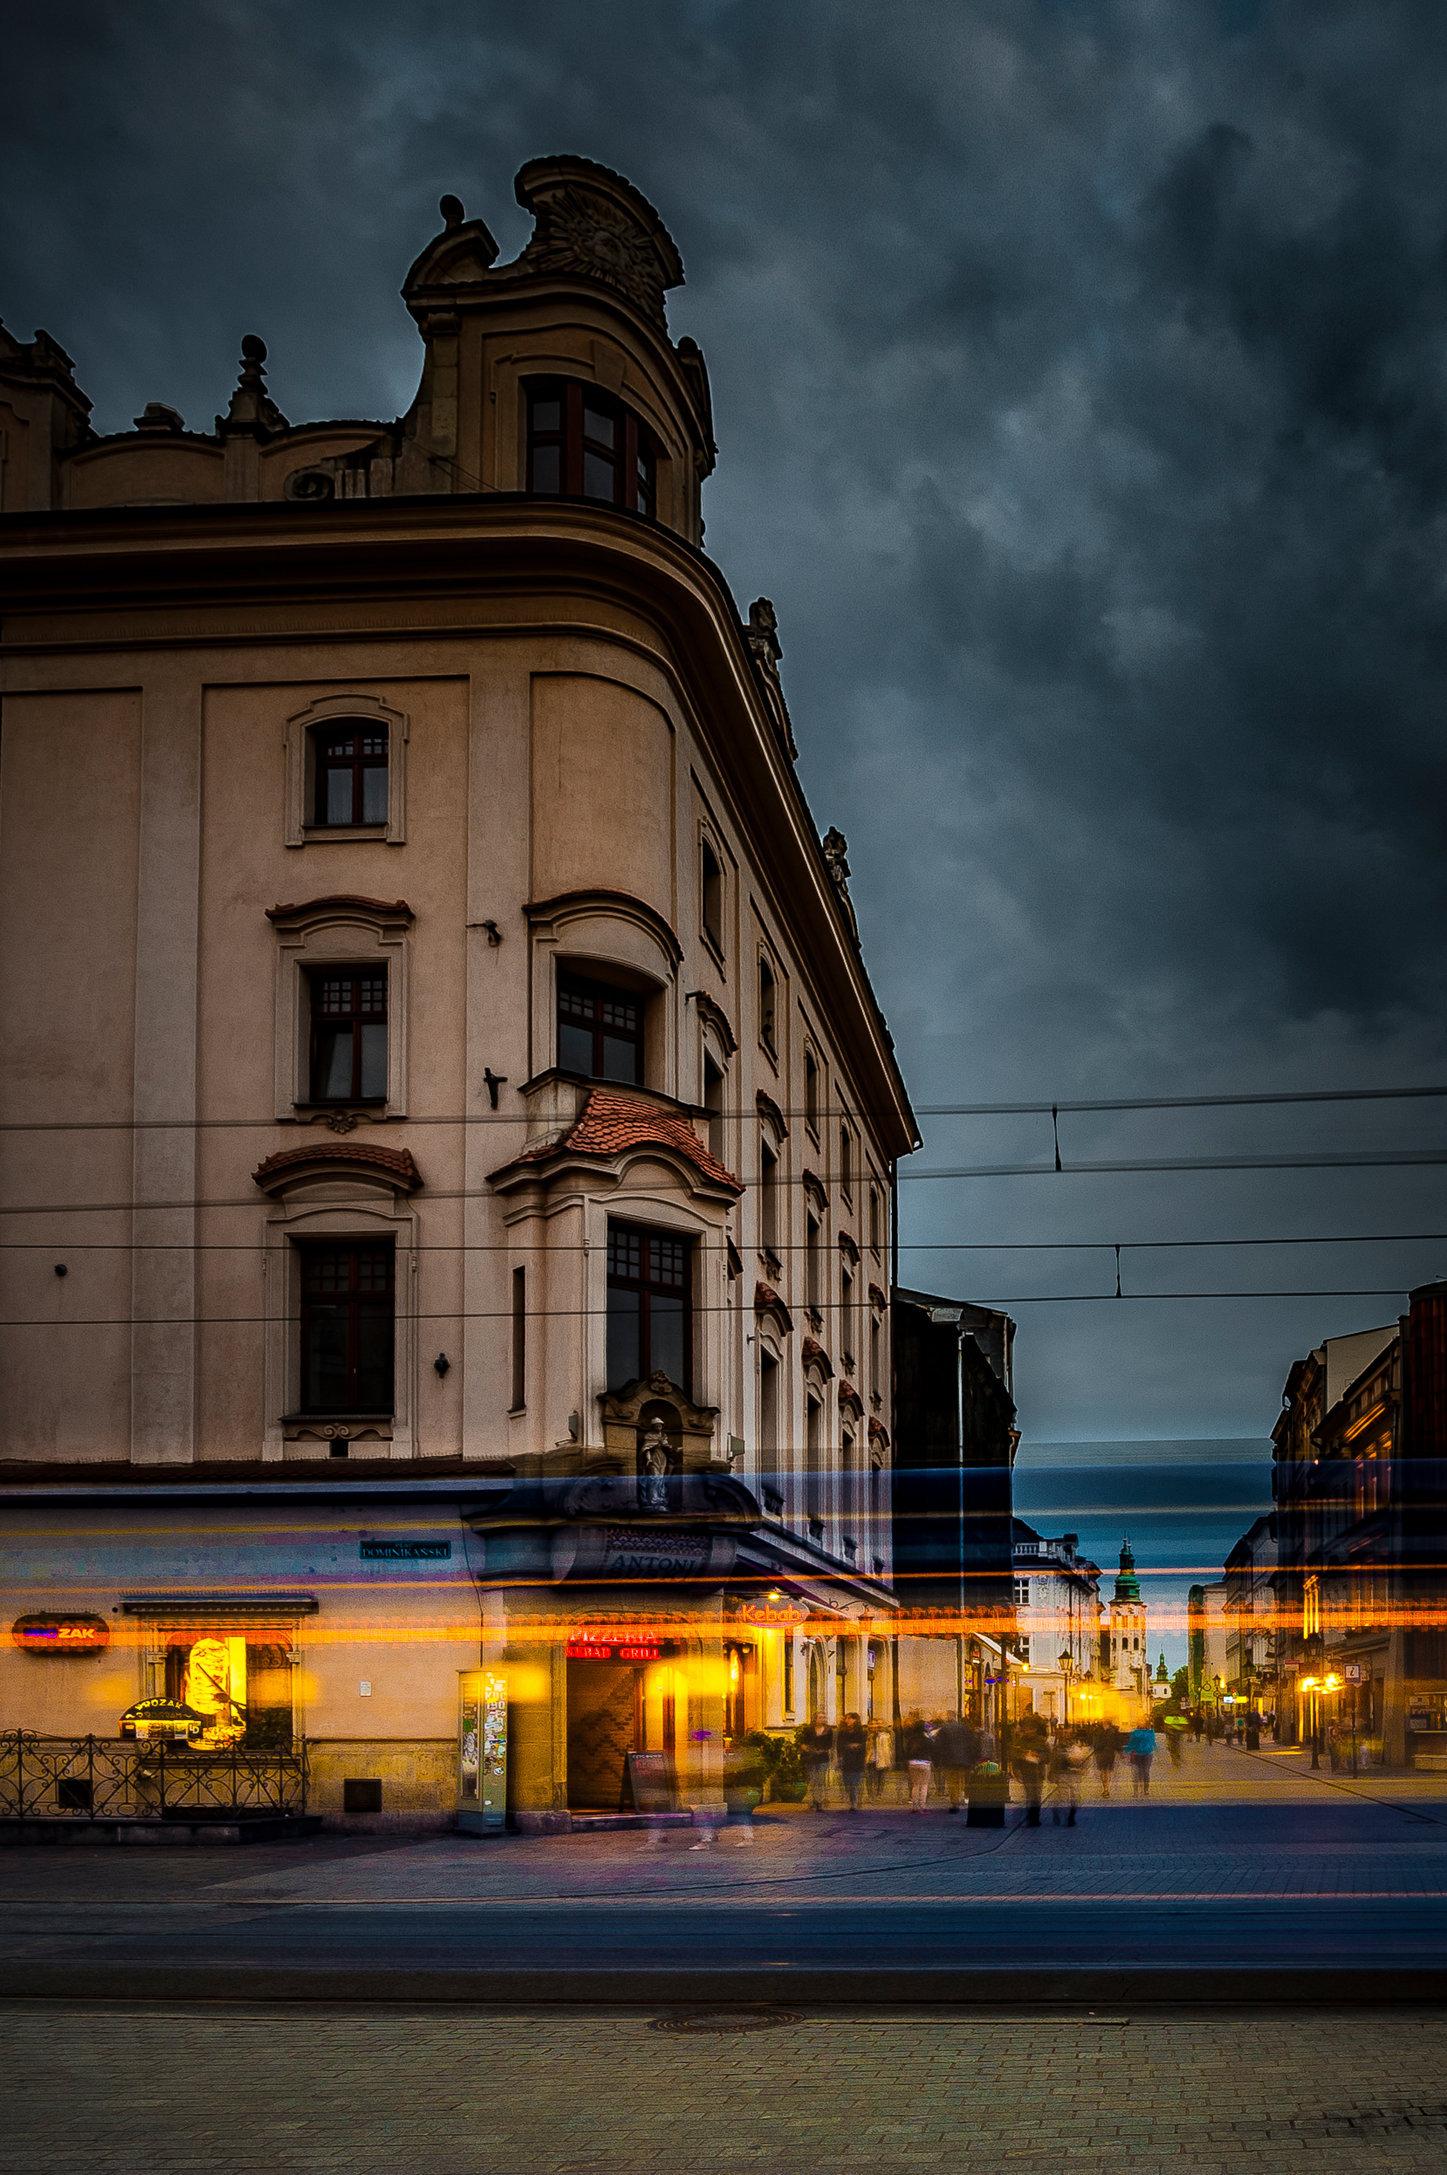 Grodzka-MASTER COPY.jpg